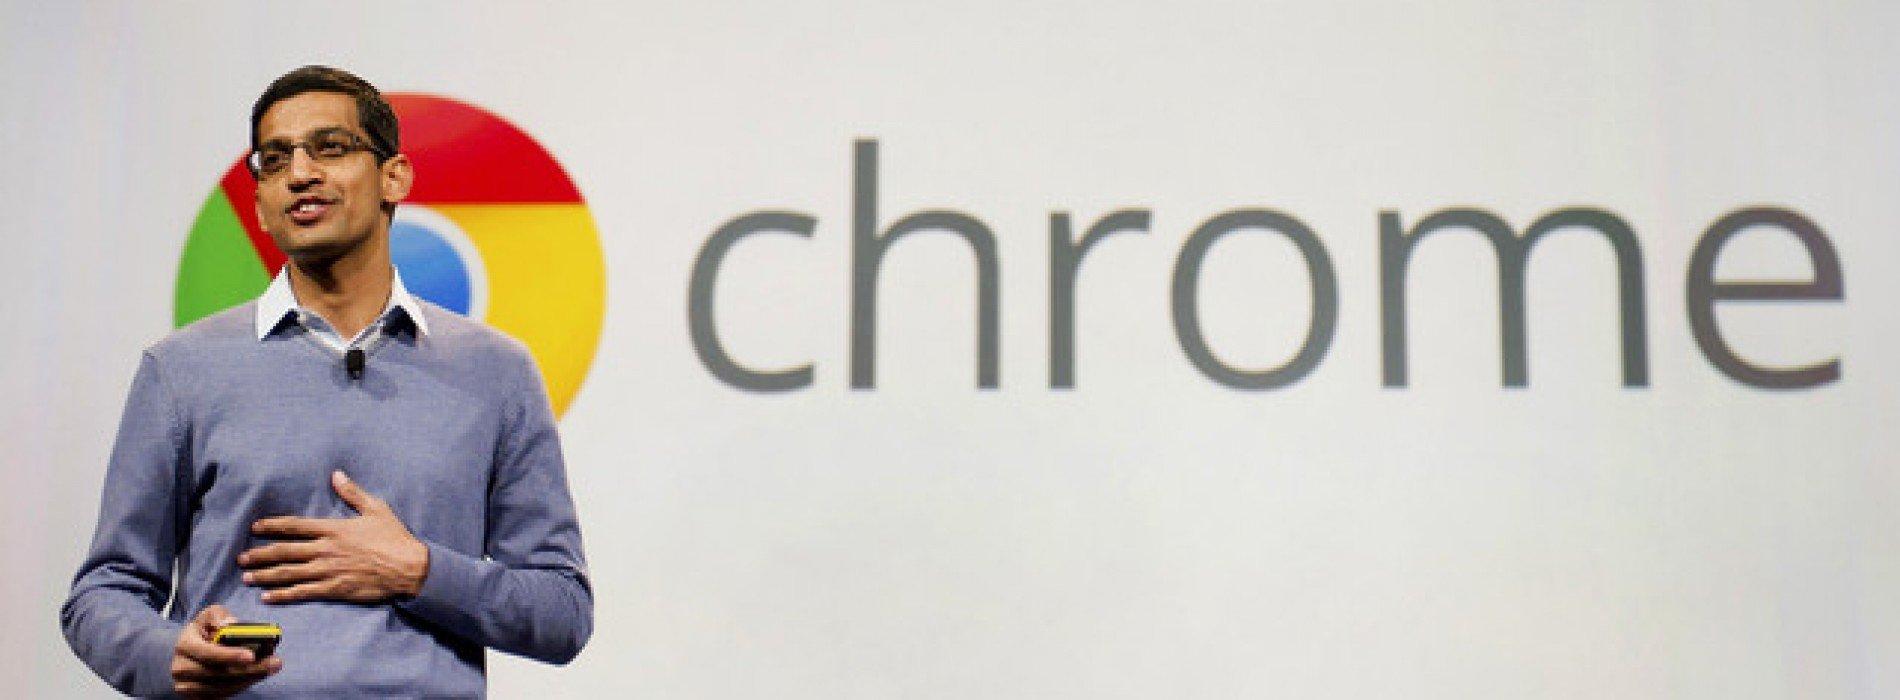 Microsoft eyeing Sundar Pichai as next CEO